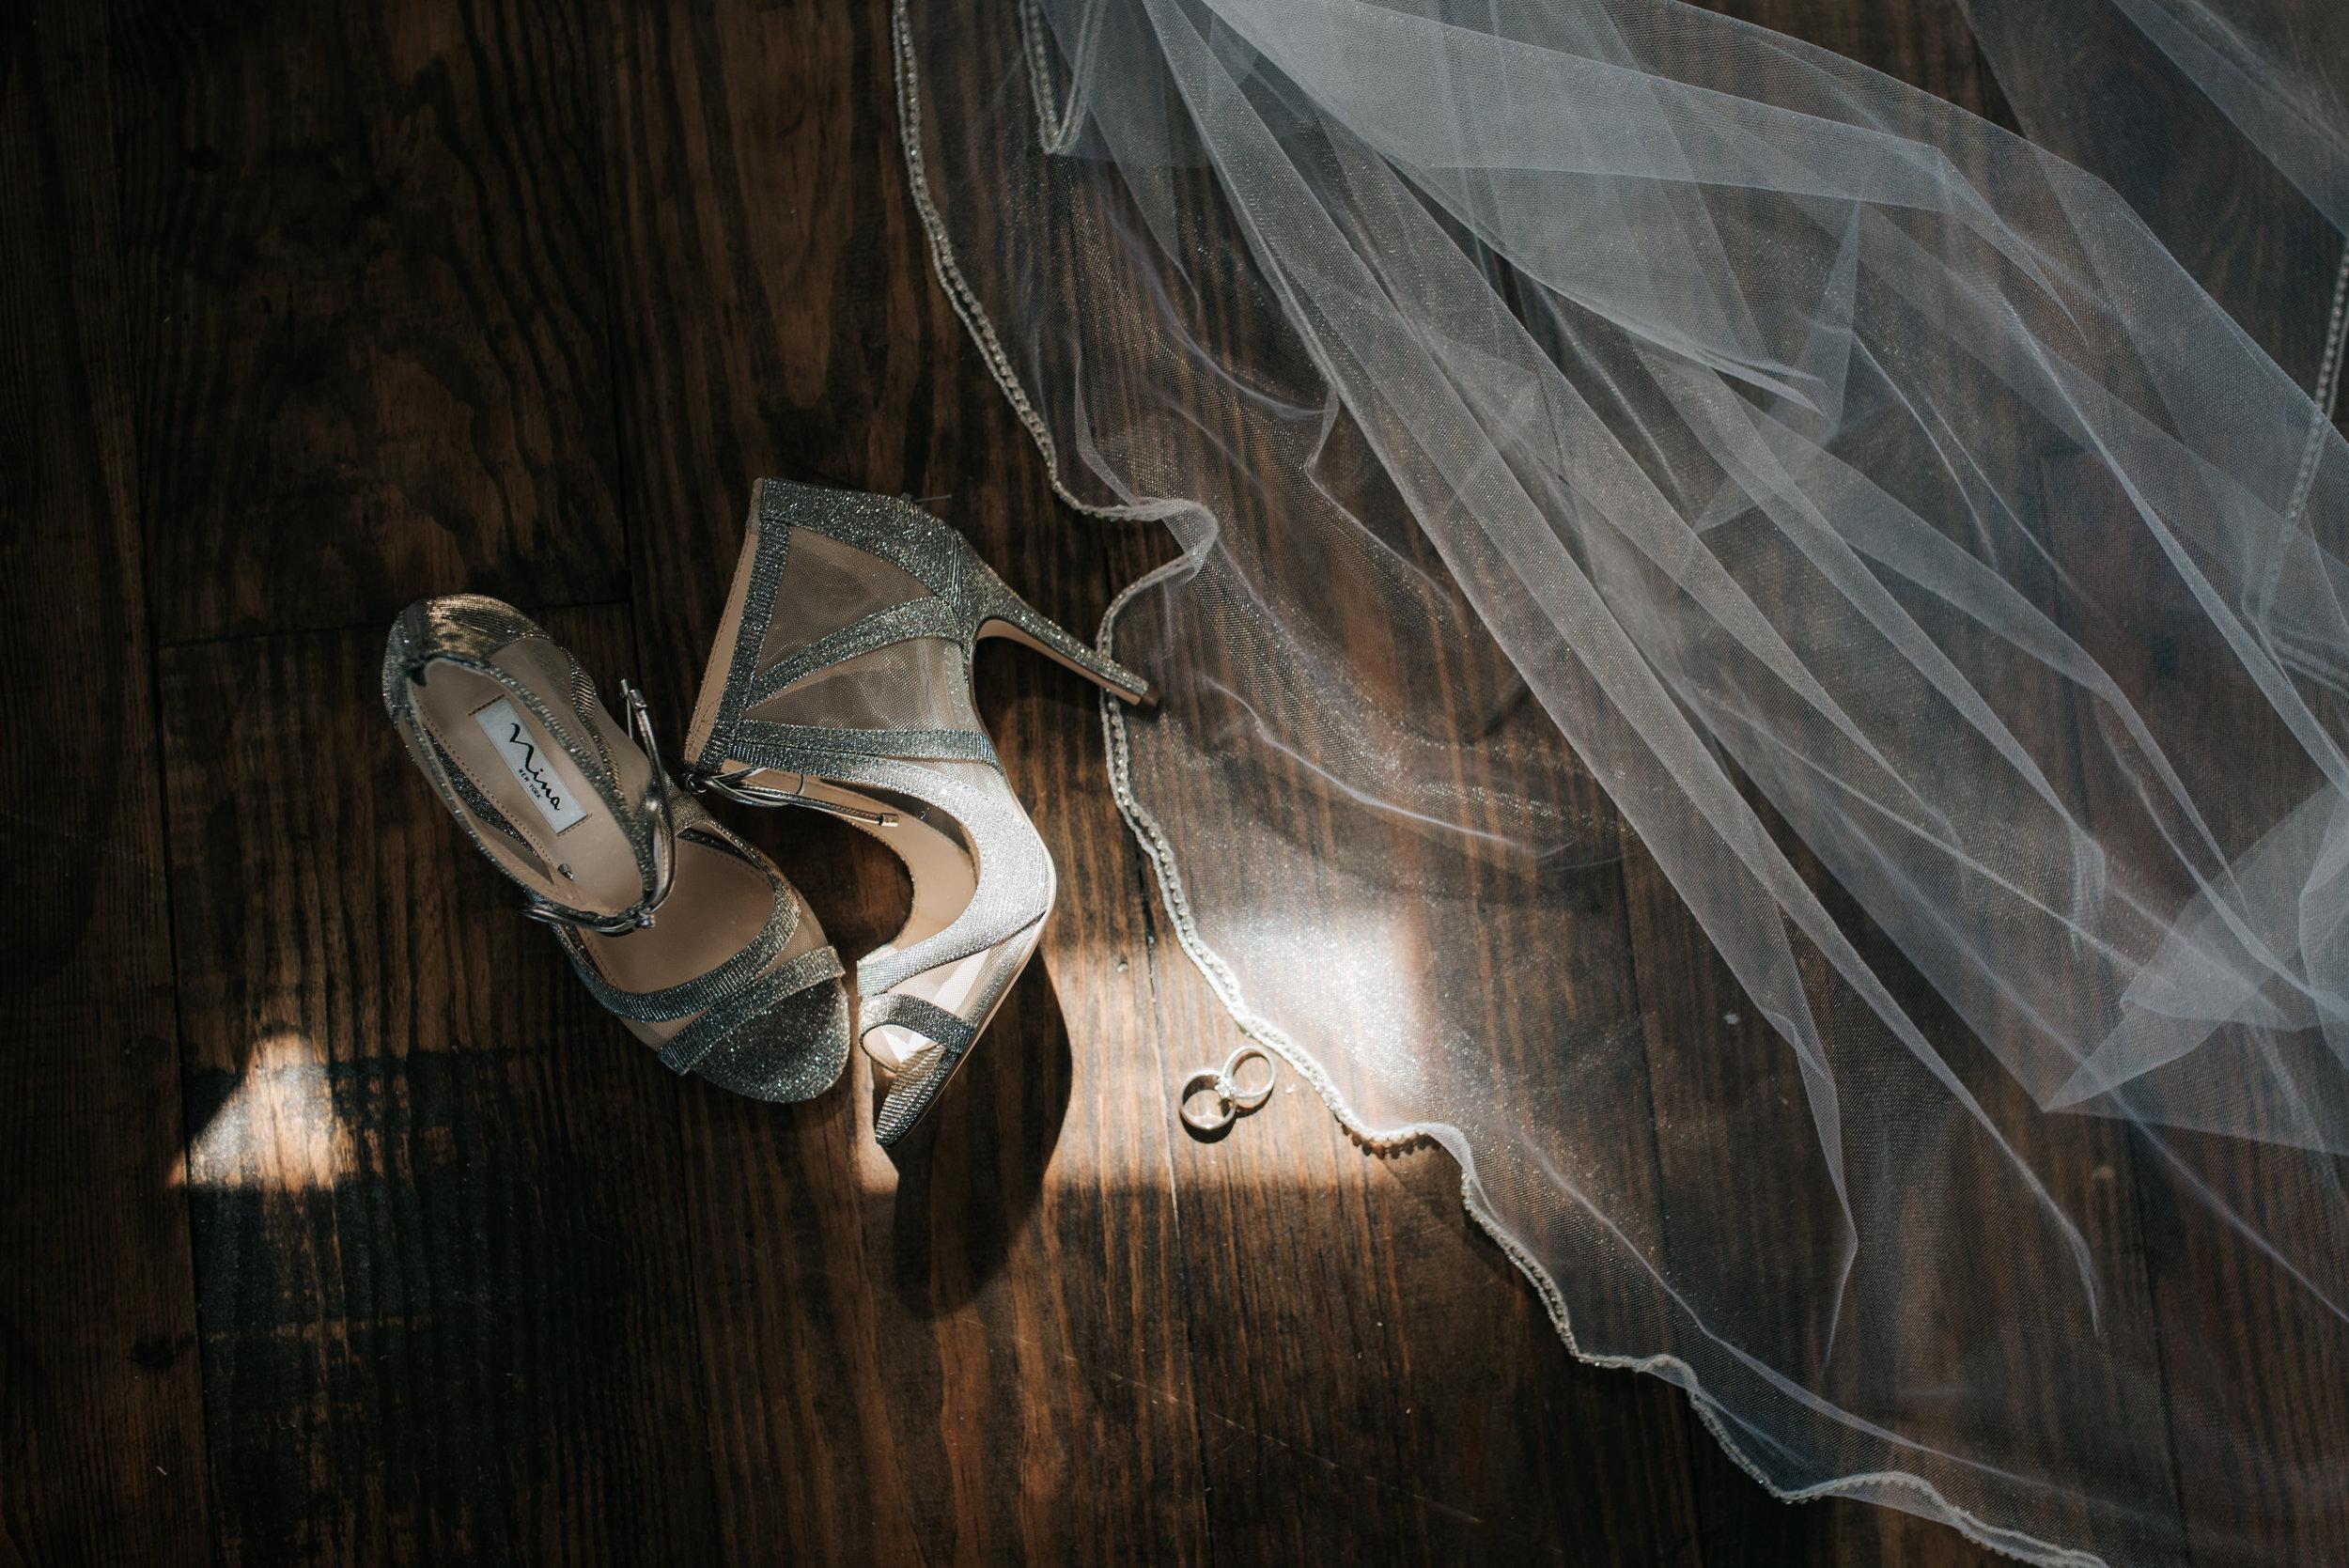 micayla-greyson-neumann-vero-beach-lake-house-winter-white-wedding-photography-7.jpg